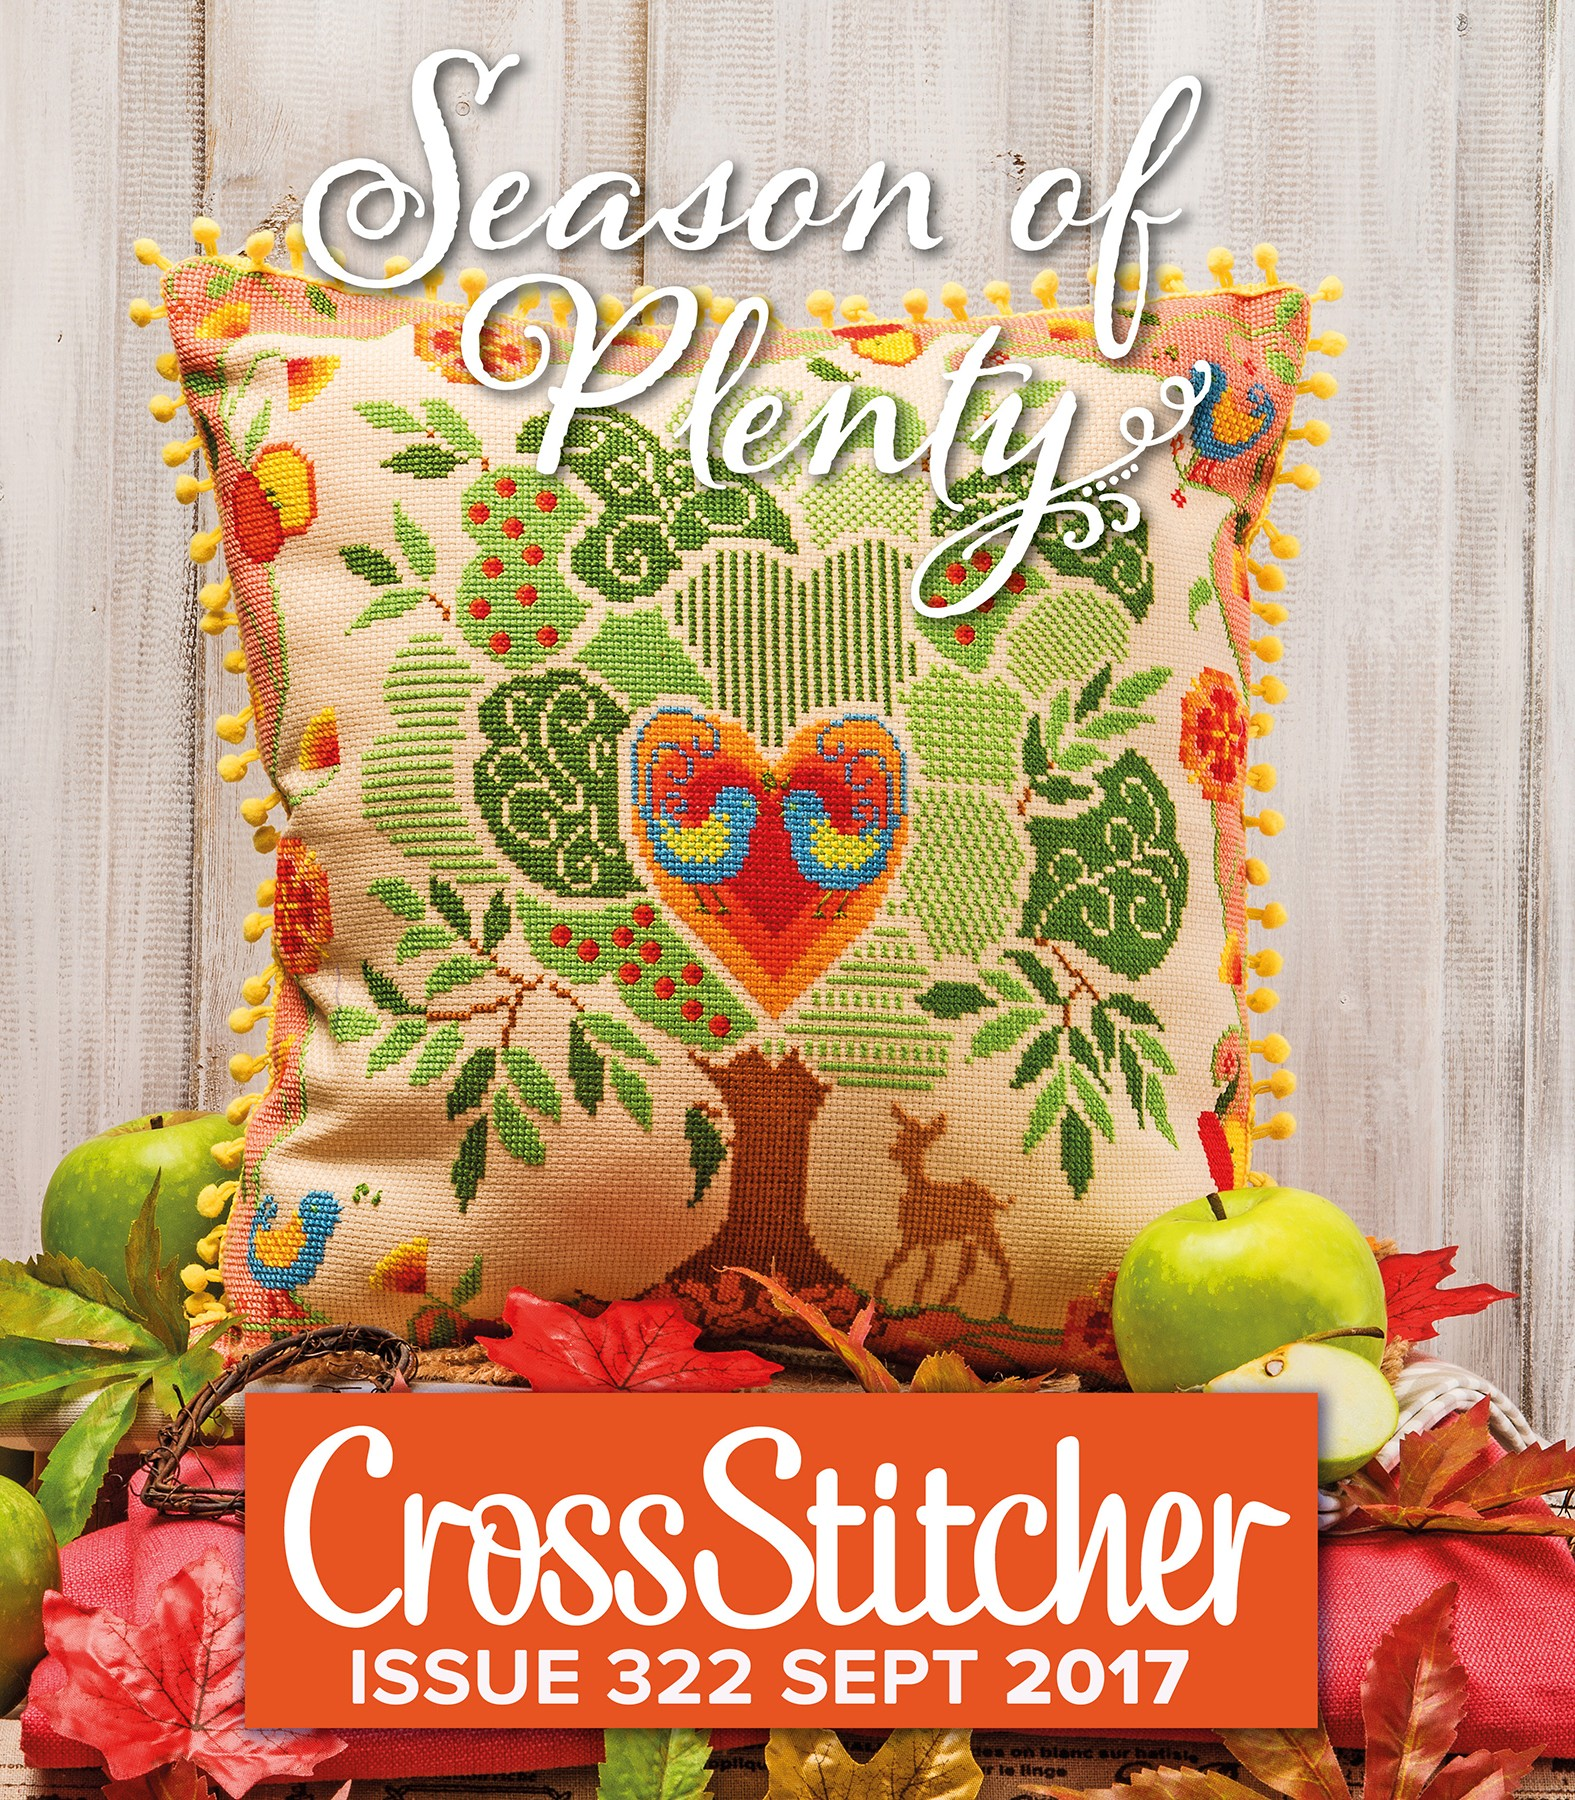 Cross Stitcher Project pack - Season of Plenty issue 322